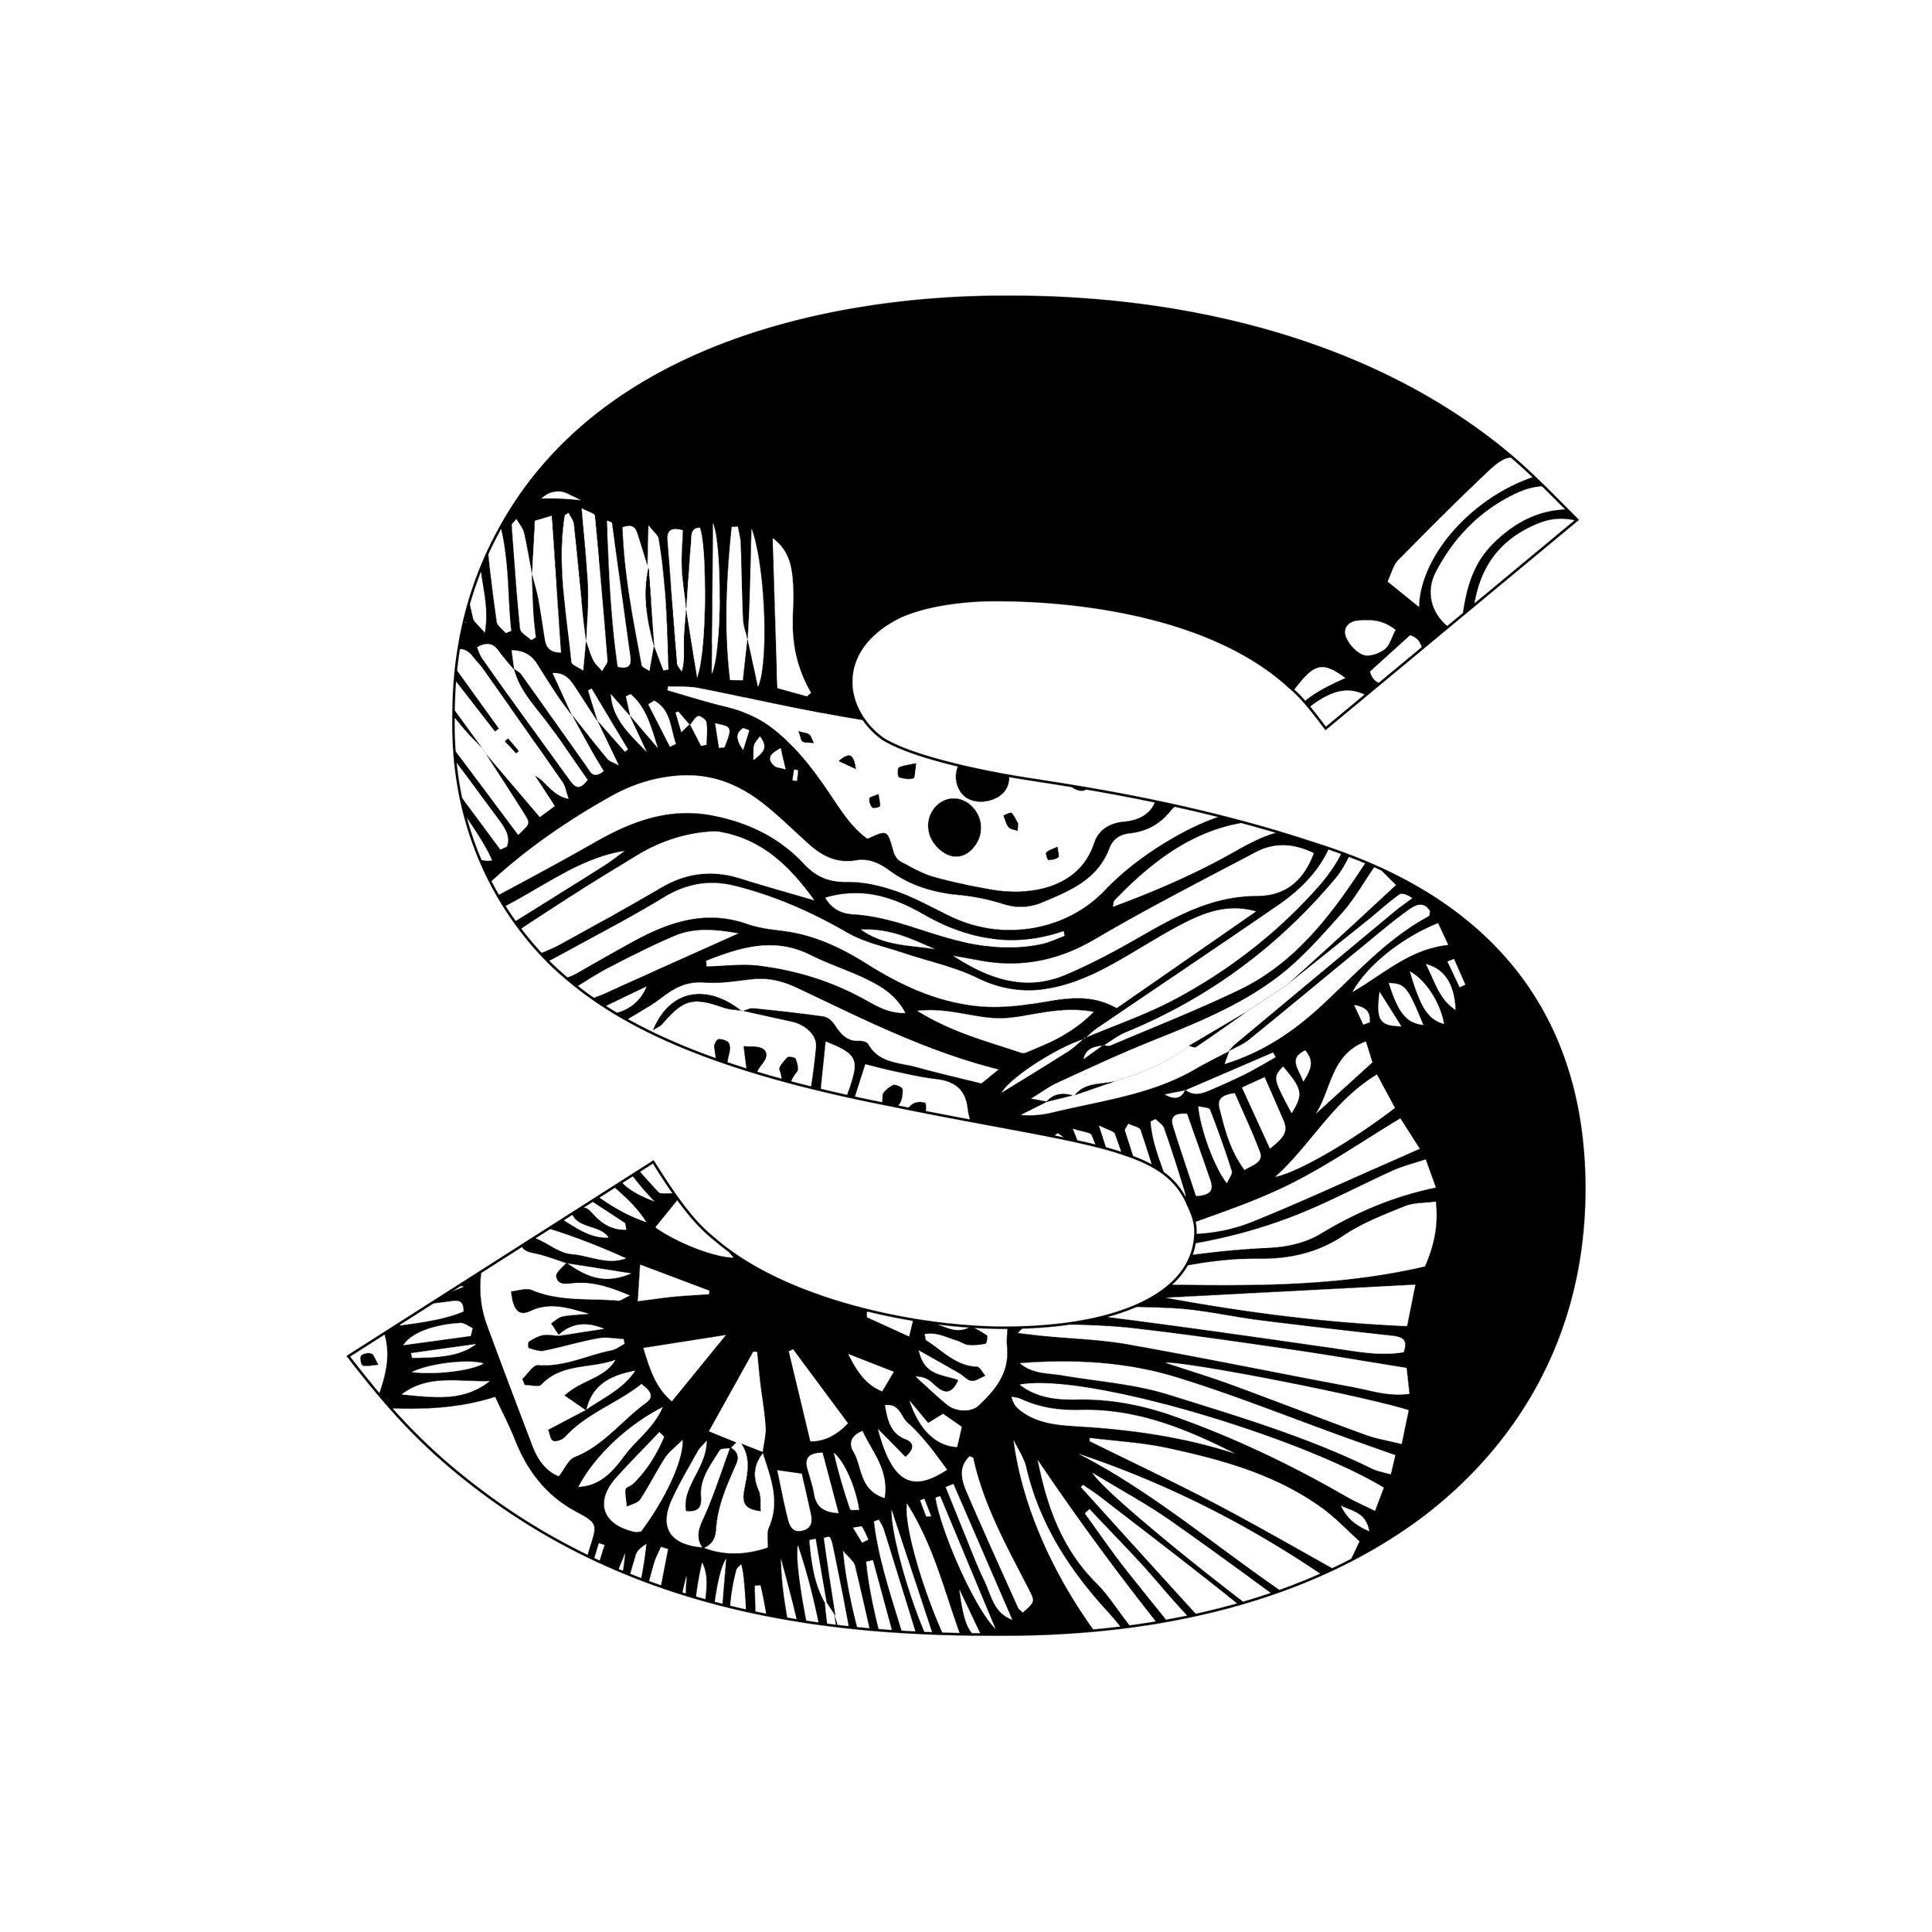 S 1-1.jpg